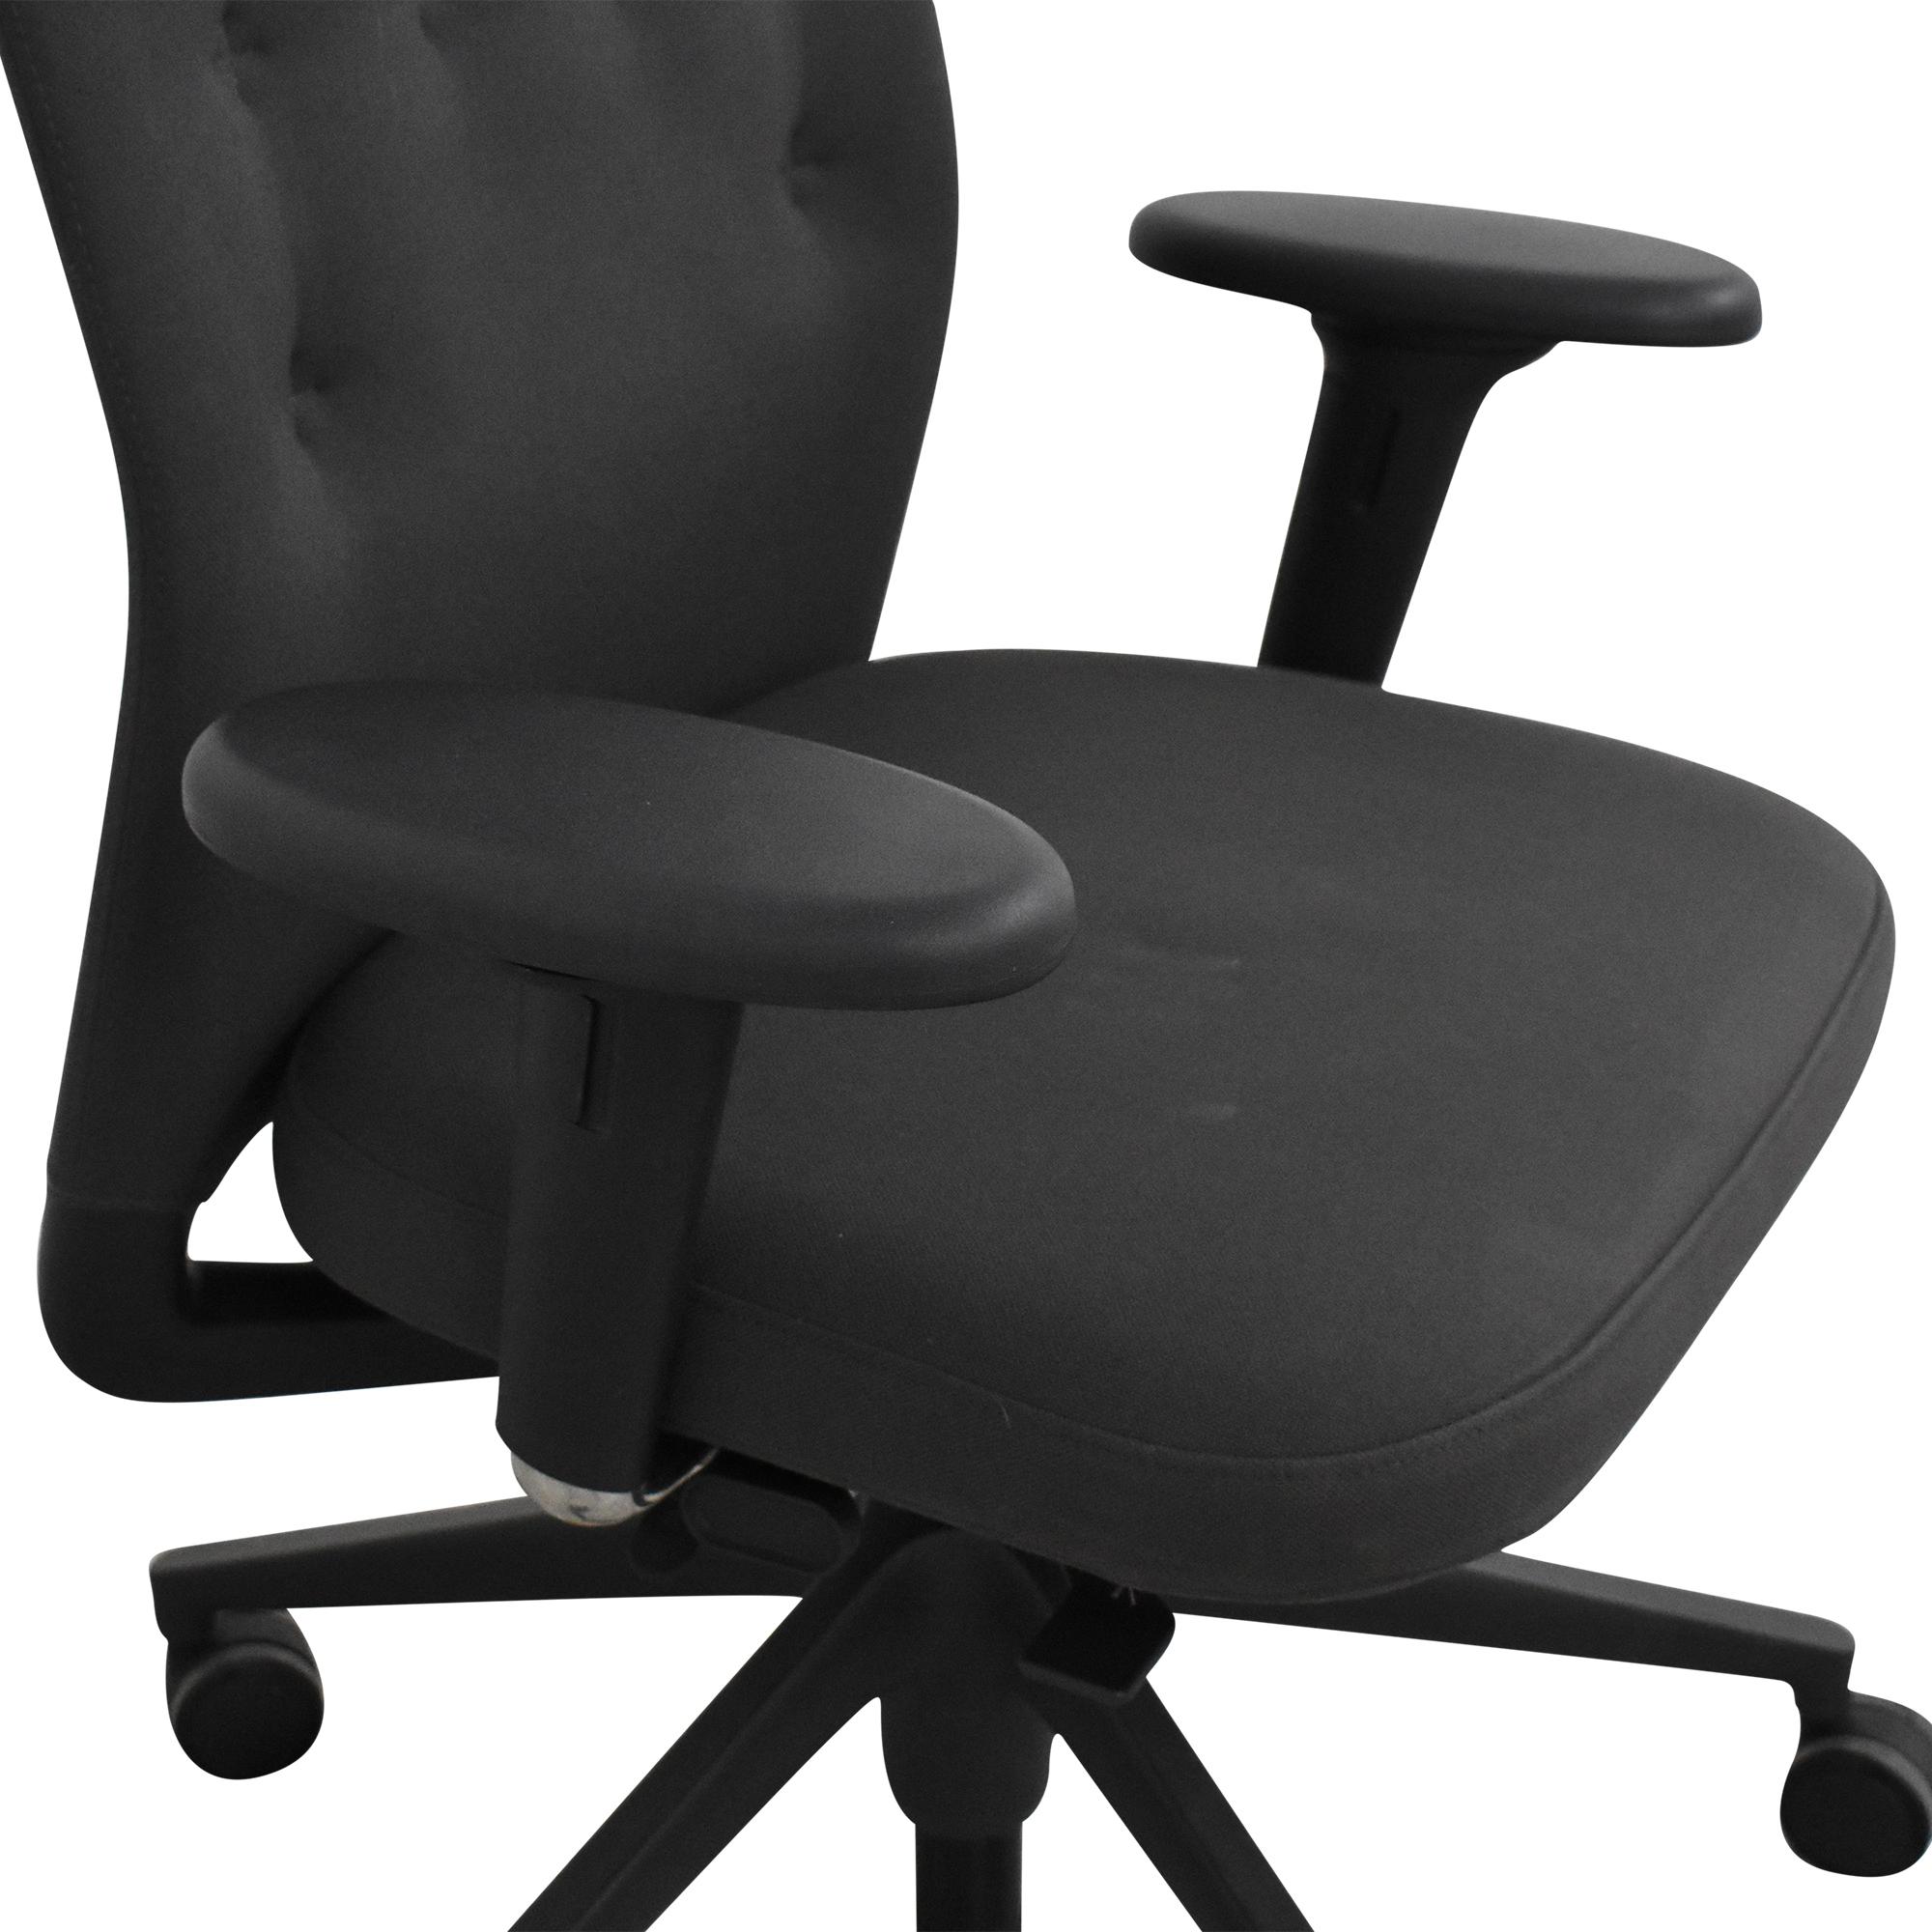 Vitra Vitra ID Trim Office Chair nj